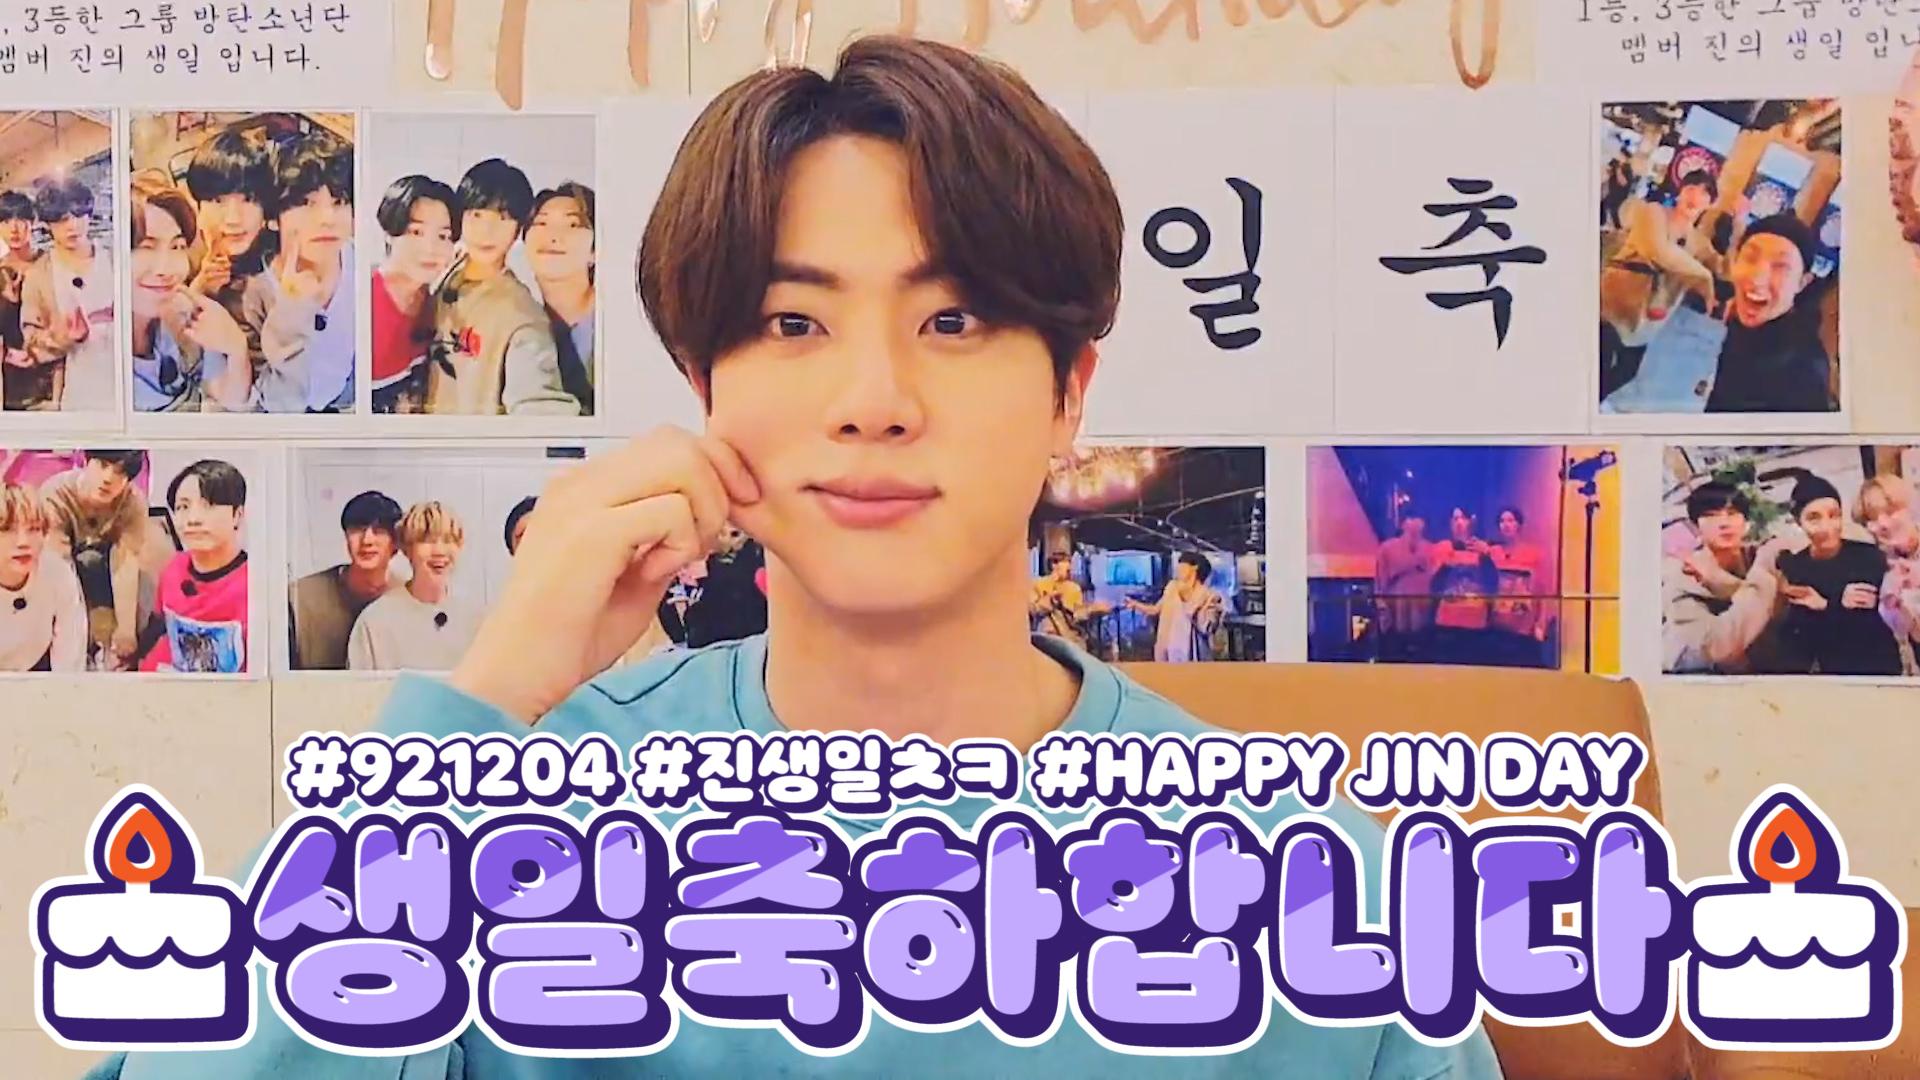 [BTS] 우리 석찌니는 이렇게 사랑 많이 받는 사람이에요💜 (HAPPY JIN DAY!)